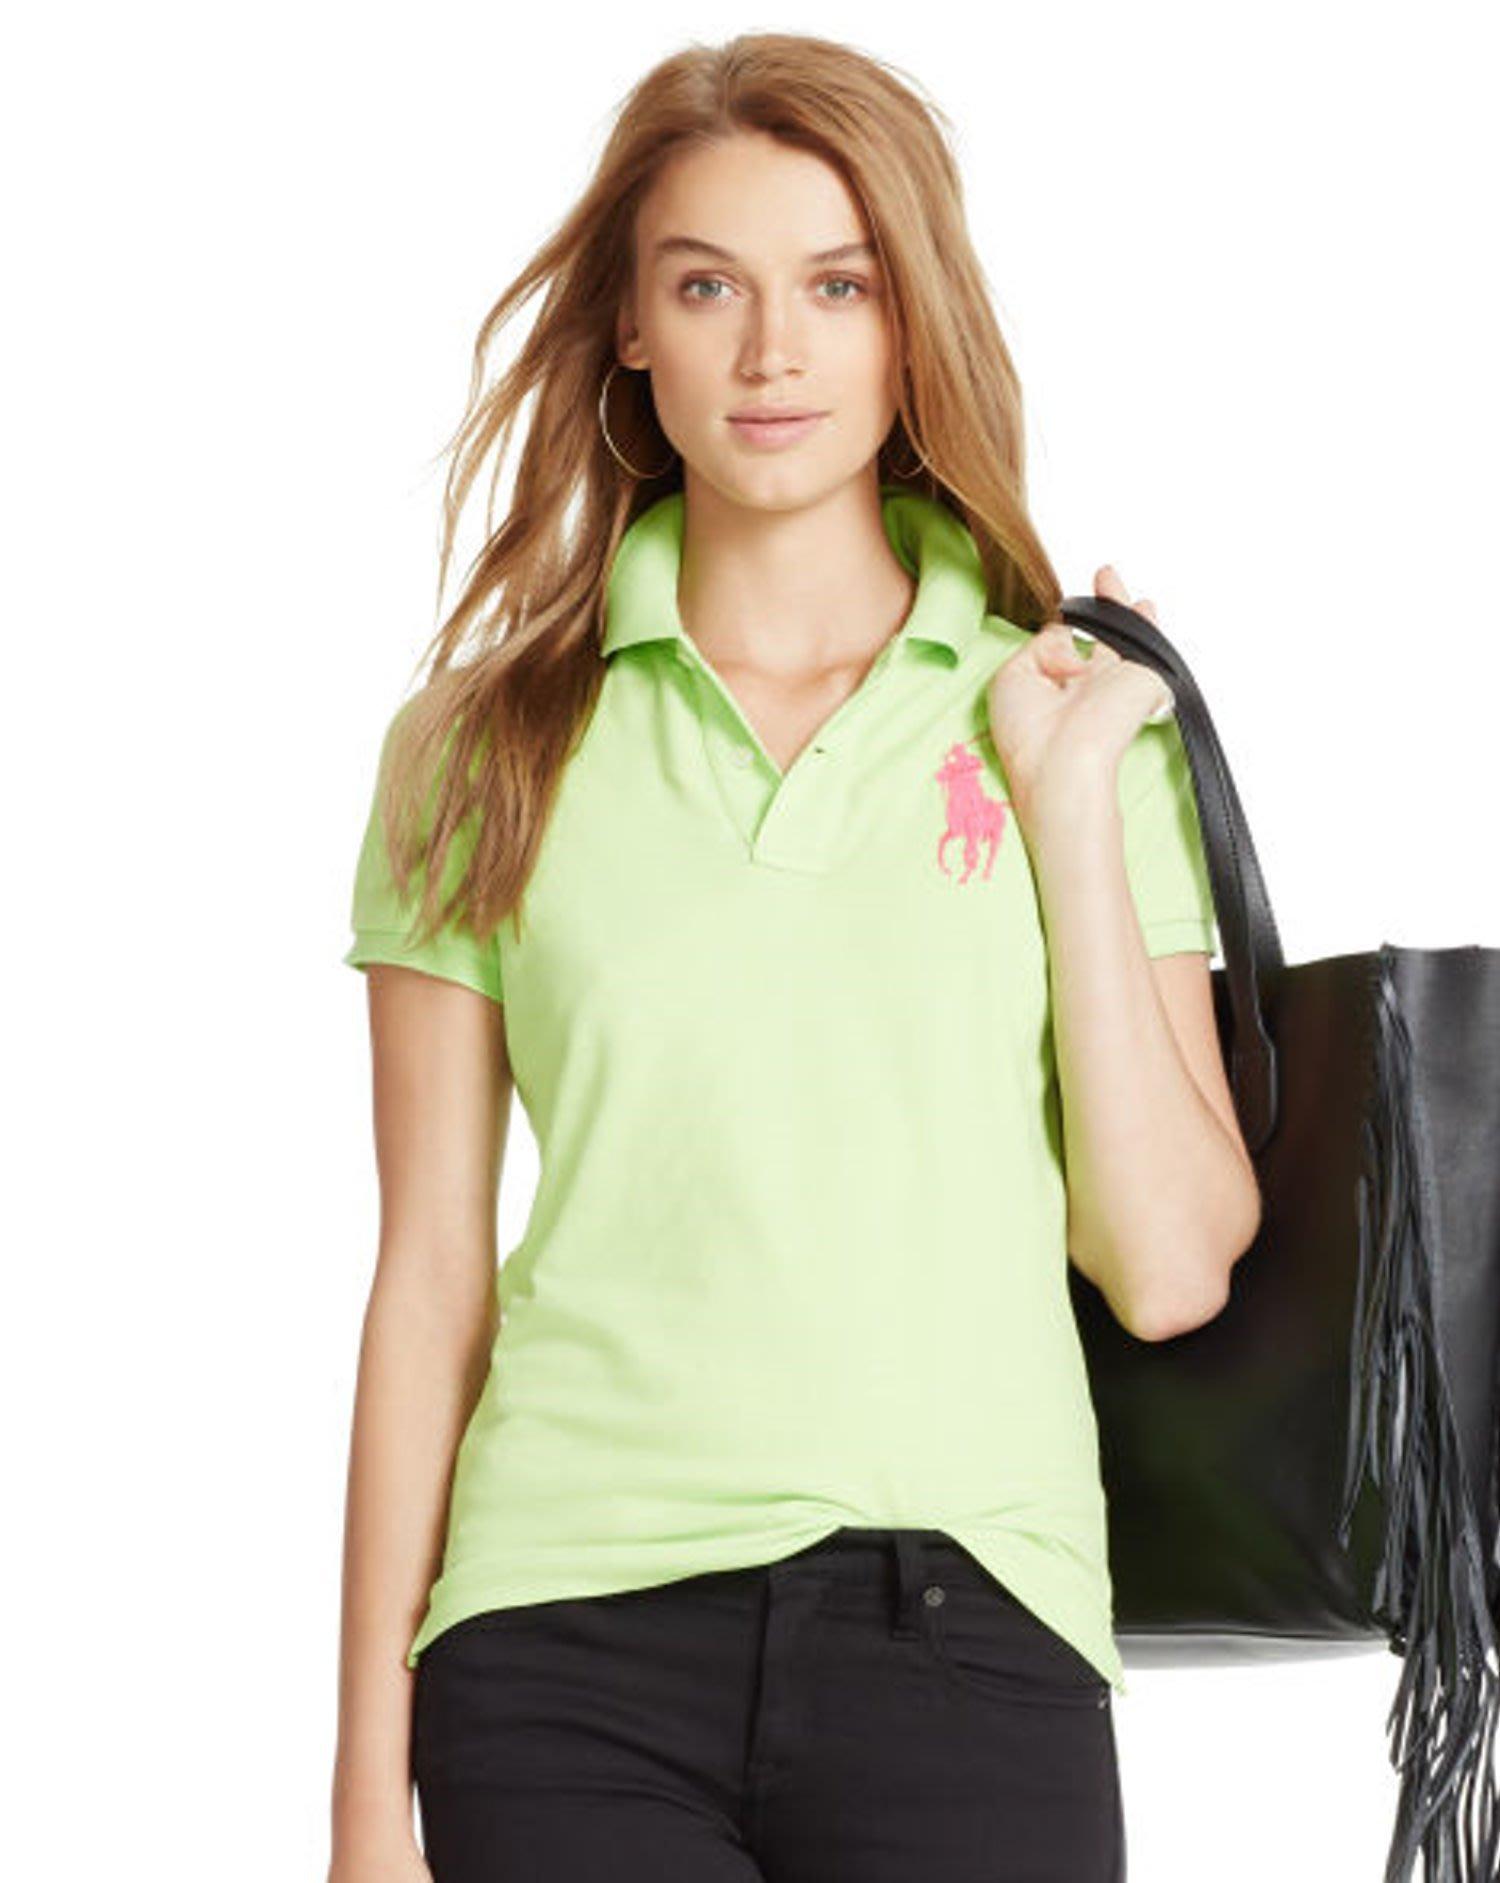 POLO Ralph Lauren 現貨 大馬 短袖 Polo衫 SKINNY FIT 綠色 XS  美國購入 保證正品